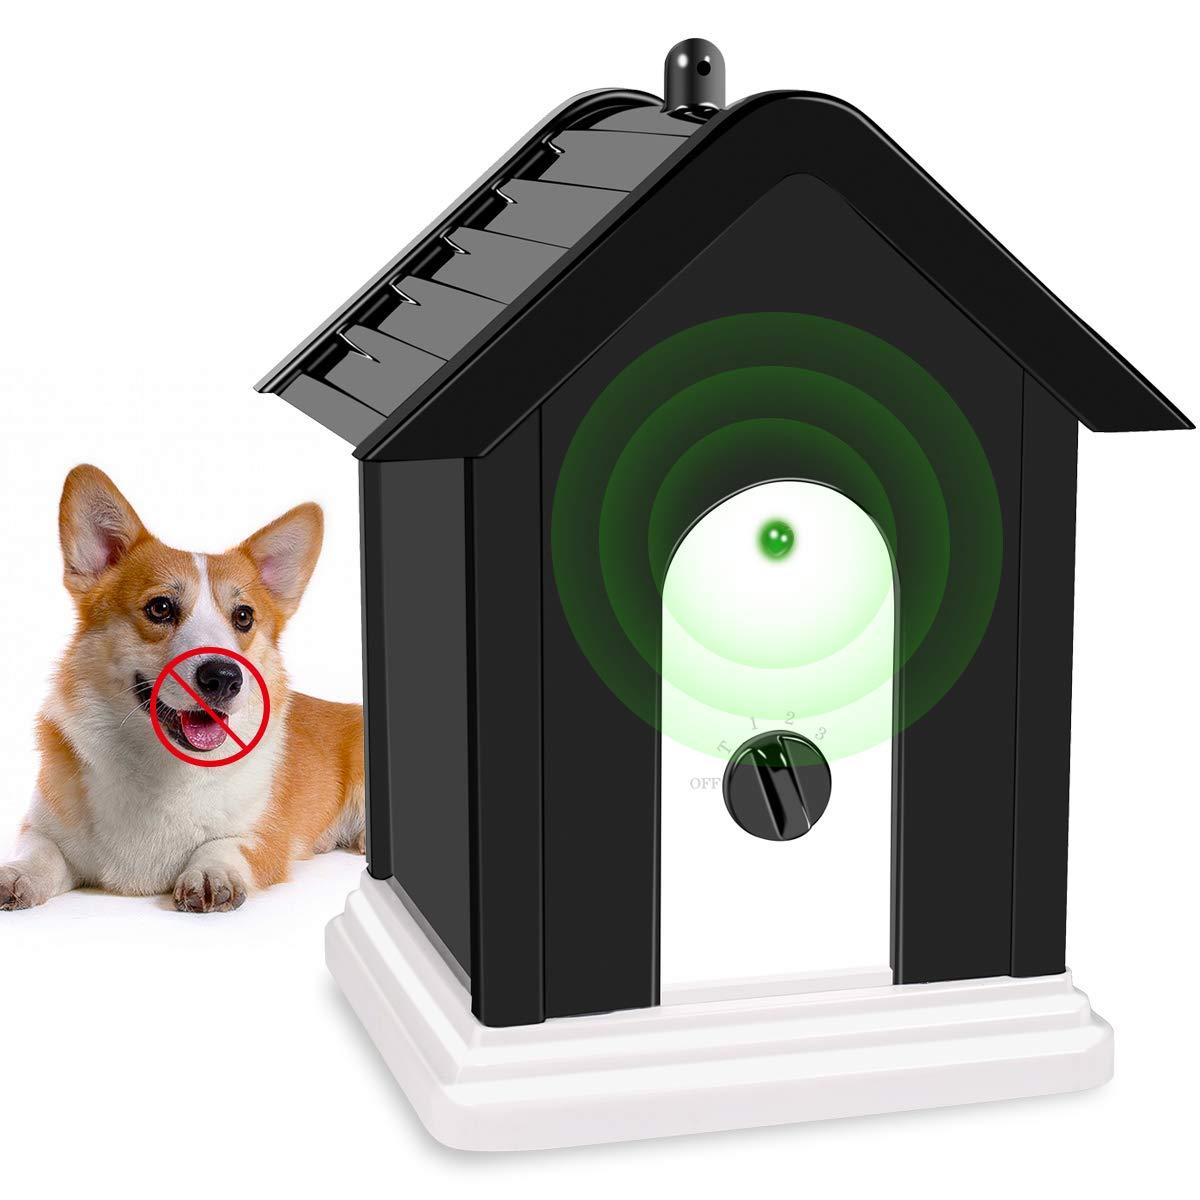 Anti Barking Device, Bark Box Dog Barking Control Devices, Ultrasonic Sonic Dog Repellent Anti Bark Deterrents Devices, Bark Control Device, Birdhouse Barking Deterrent, Dog Repellent, Bark Control by Vitorun